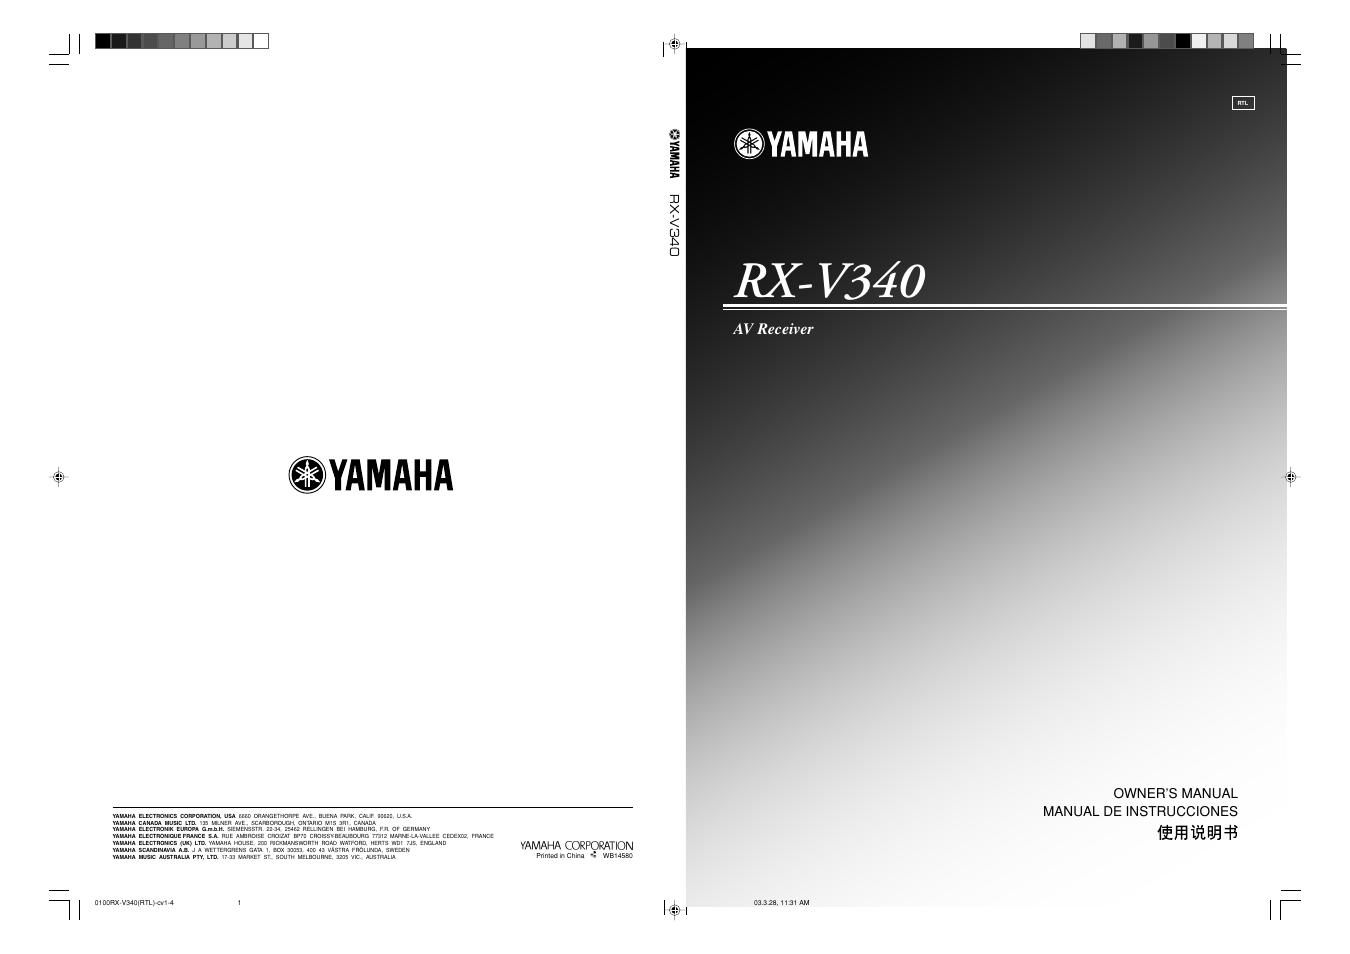 Yamaha RX-V340 User Manual | 60 pages